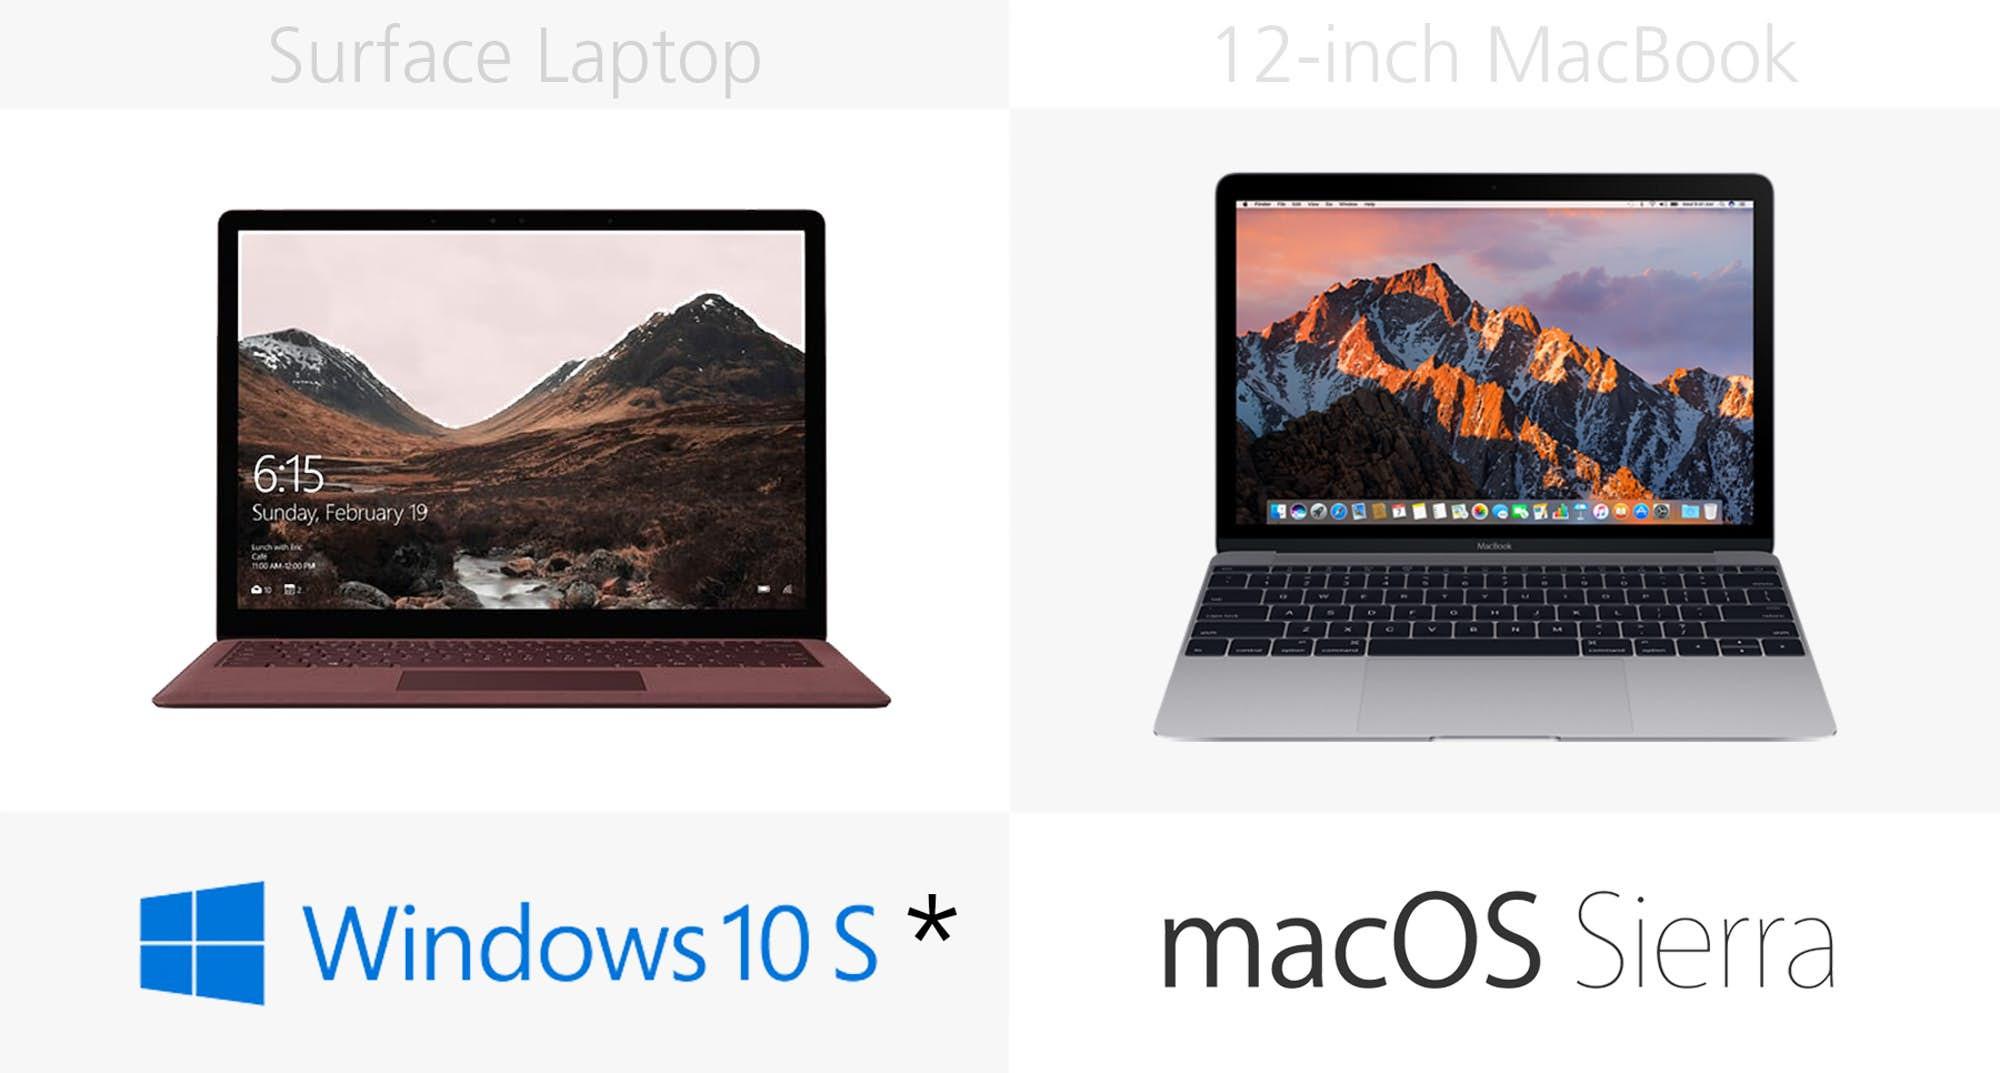 1493888177_apple-macbook-vs-microsoft-surface-laptop-4.jpg